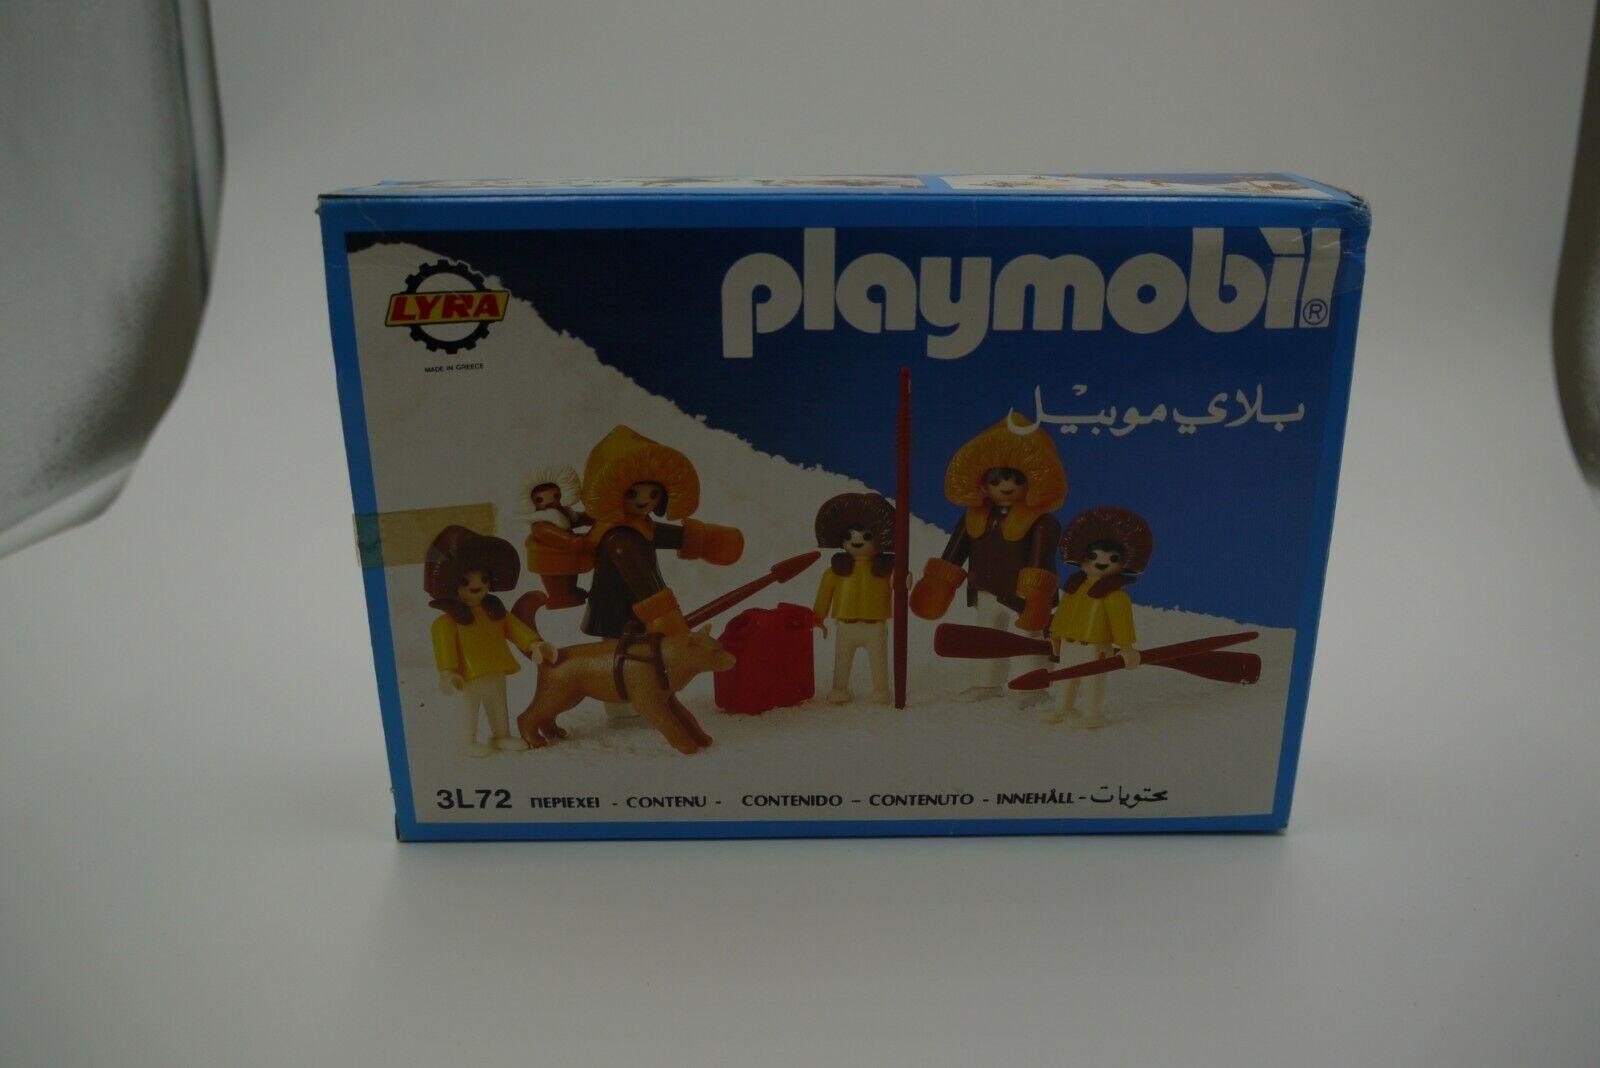 PLAYMOBIL 3L72 3L72 3L72 GREEK LYRA ESKIMO FAMILY FIGURE SET MIB d64324